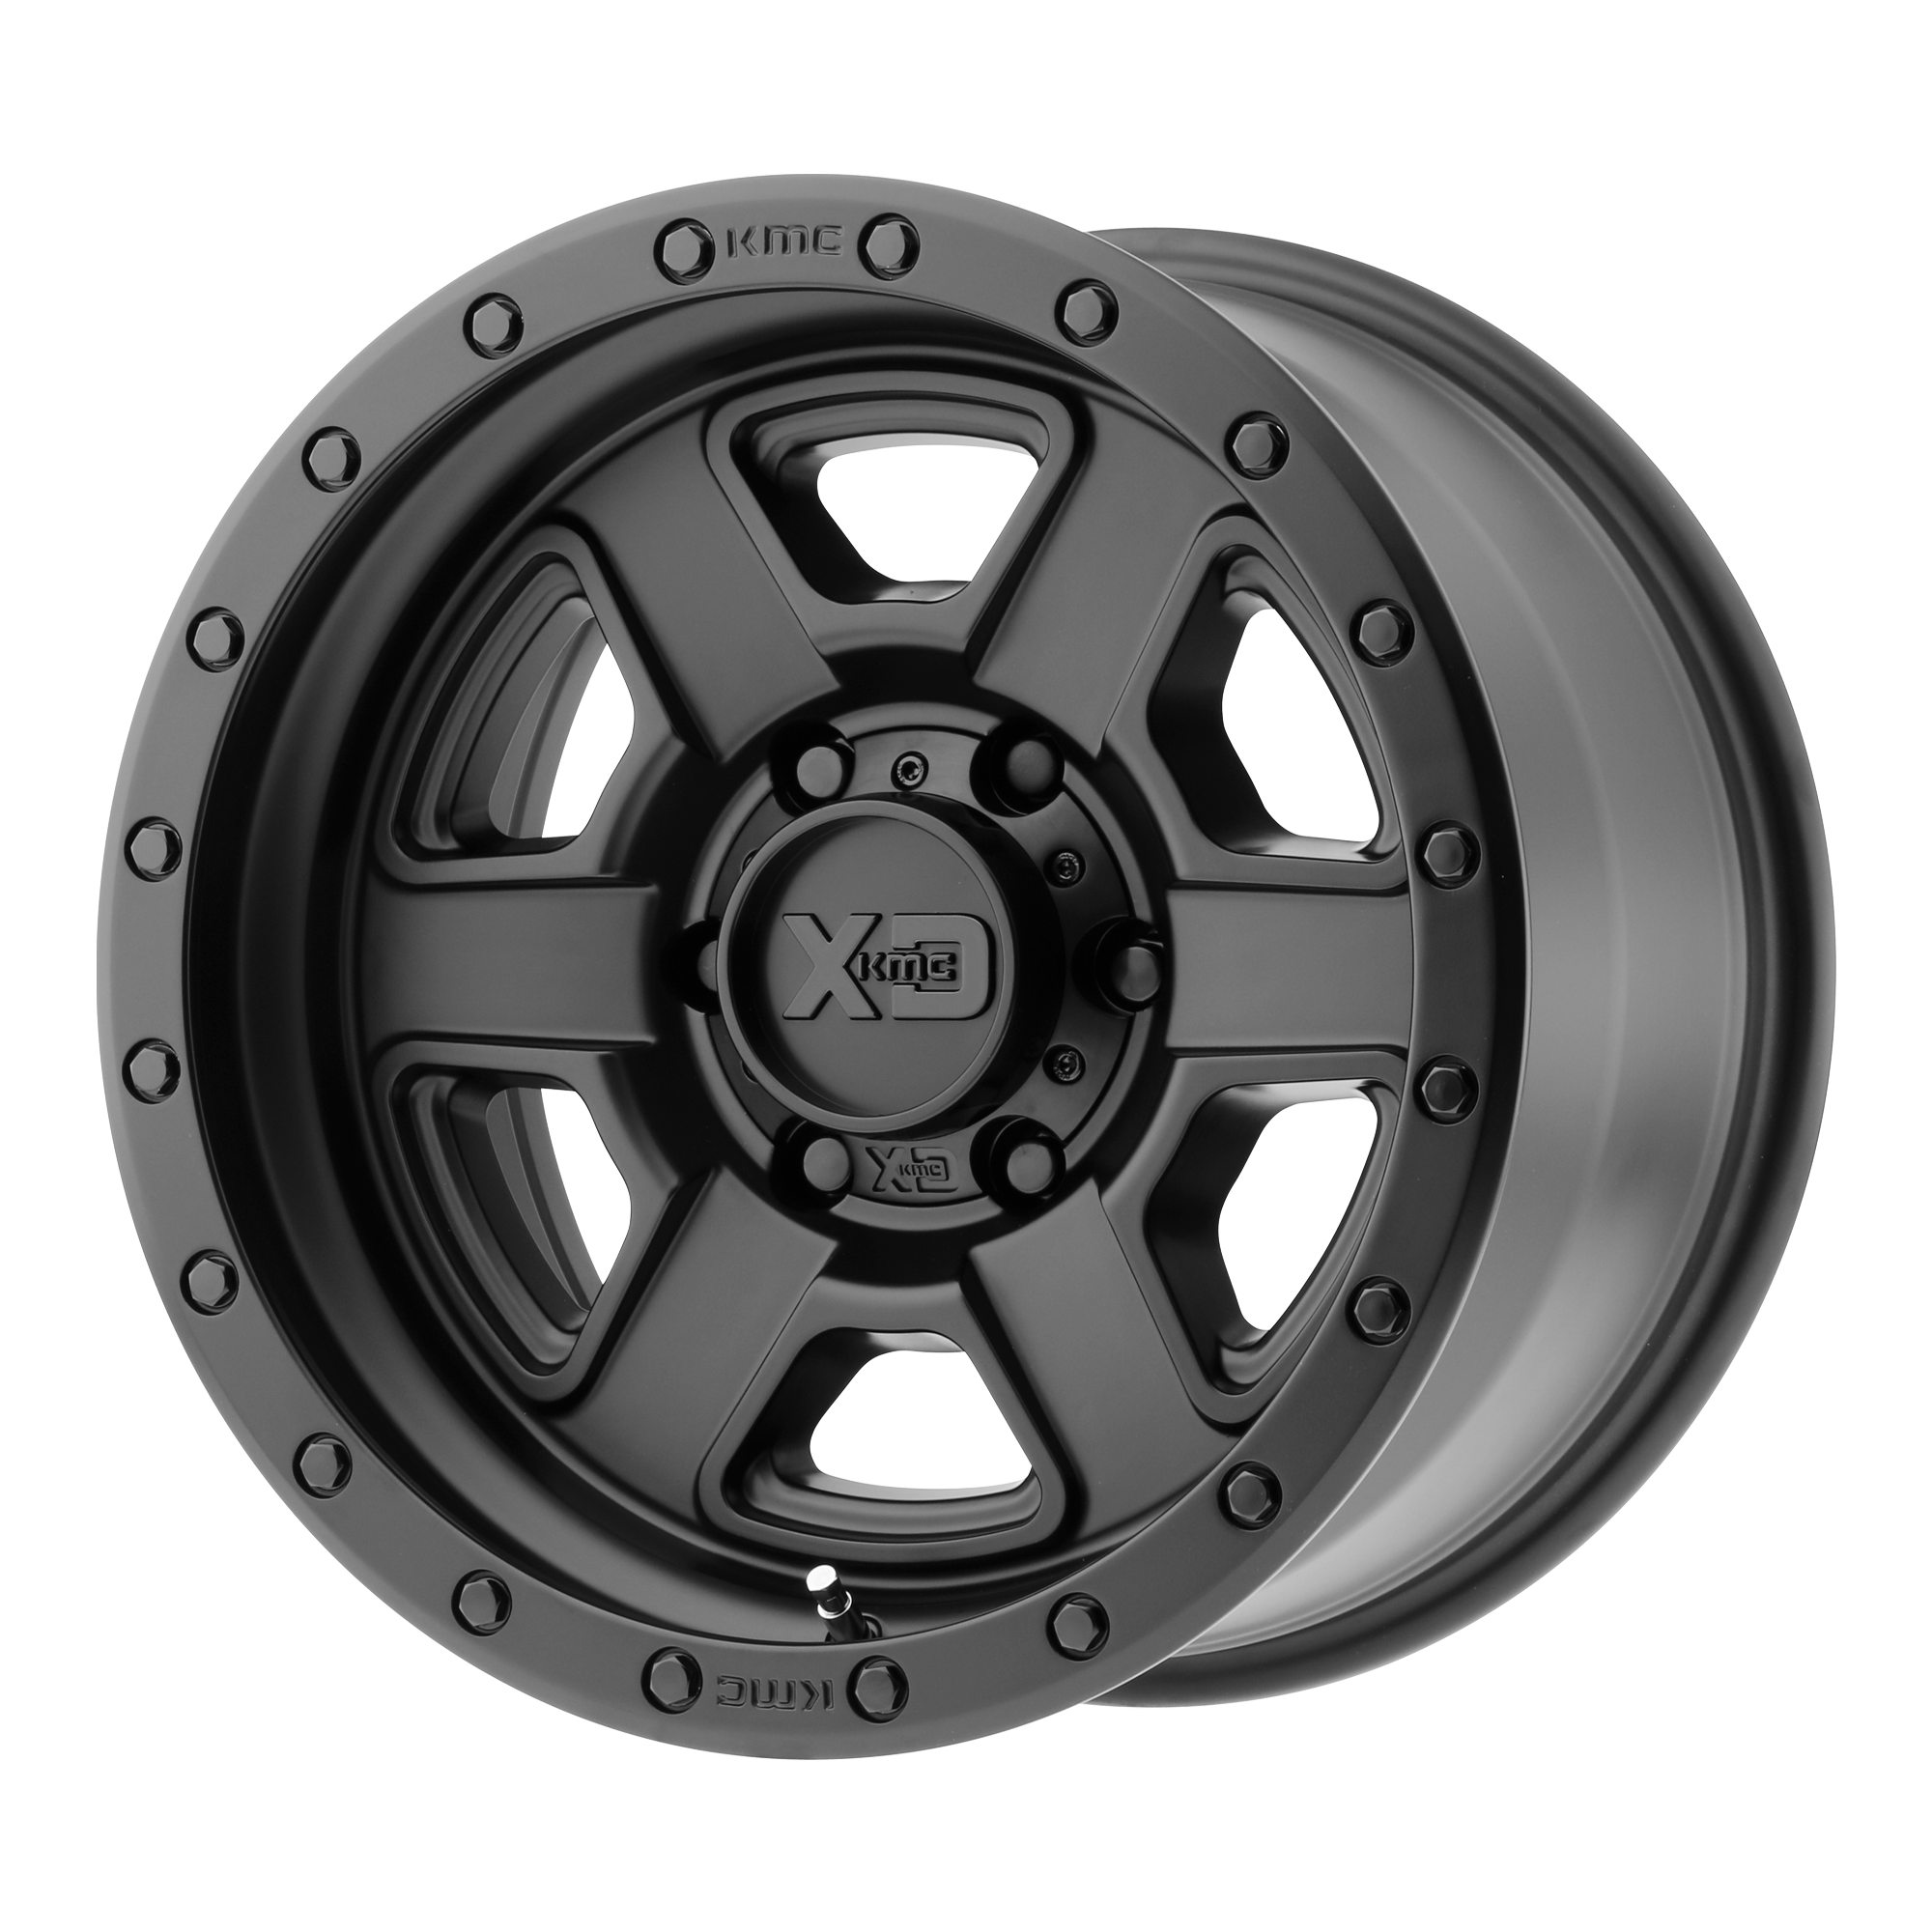 XD SERIES XD133 FUSION OFF-ROAD hliníkové disky 9x17 5x127 ET-12 Satin Black